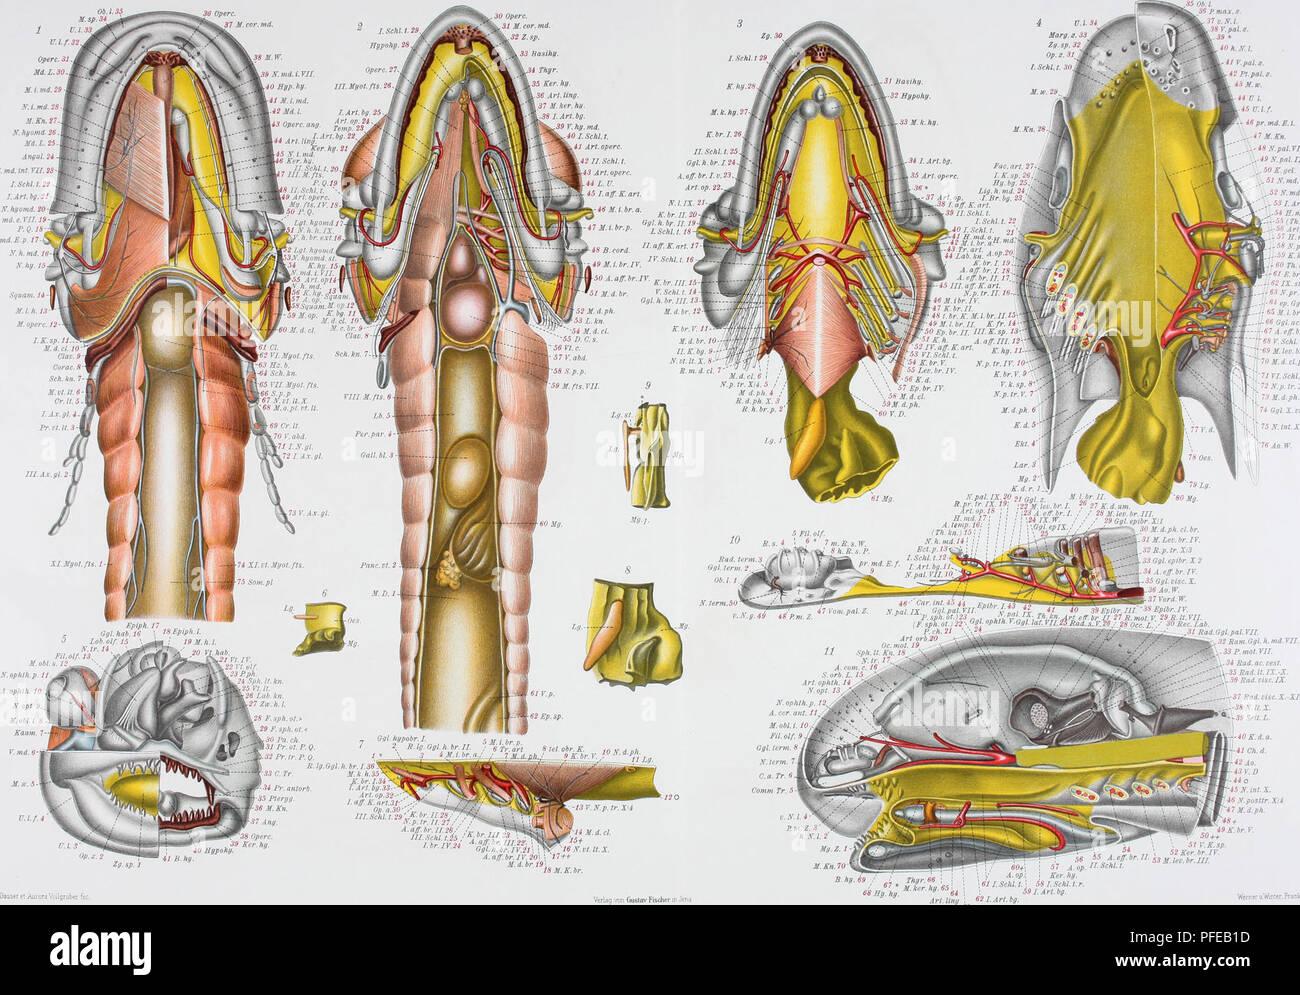 ". Denkschriften der Medicinisch-Naturwissenschaftlichen Gesellschaft zu Jena. Greil, Entwickld. Kopfes u.Gefäfssystemsv Ceratodus Forsten JEN.DENKSCHRIFTEN, Bd.IV. Semon. Forschungsreisen, Bd.i. Taf. LXIX. 35 Ob. L ' 1 P. max. z. 37o.N.l. HSV. pal. z. Operc.31. Md. £.30. M. i. md, 29 AT.i.md.28- M. Kn.il. K.hgomd.26. Md. L. 25 Angal. 24 N. md. int. VII.2. I. Schi. t. 22 I. Art.bg. 21- N. hgomd. 20 N.md.e.ril.19 F. Q.18 Hgomd.E.p.ll- K. h. md. 16 X. hg. 15 h. N. I. 41 V.jial. z. 42 Pt.pal. z. M.w. 44 U l. 45 V.l.f. - 46 pr.md.E.t. ..-Â«'"" M.Kn. _..-4HN.pal.VII. ,-49 N. pal. IX. â¢'' .50 Stock Photo"